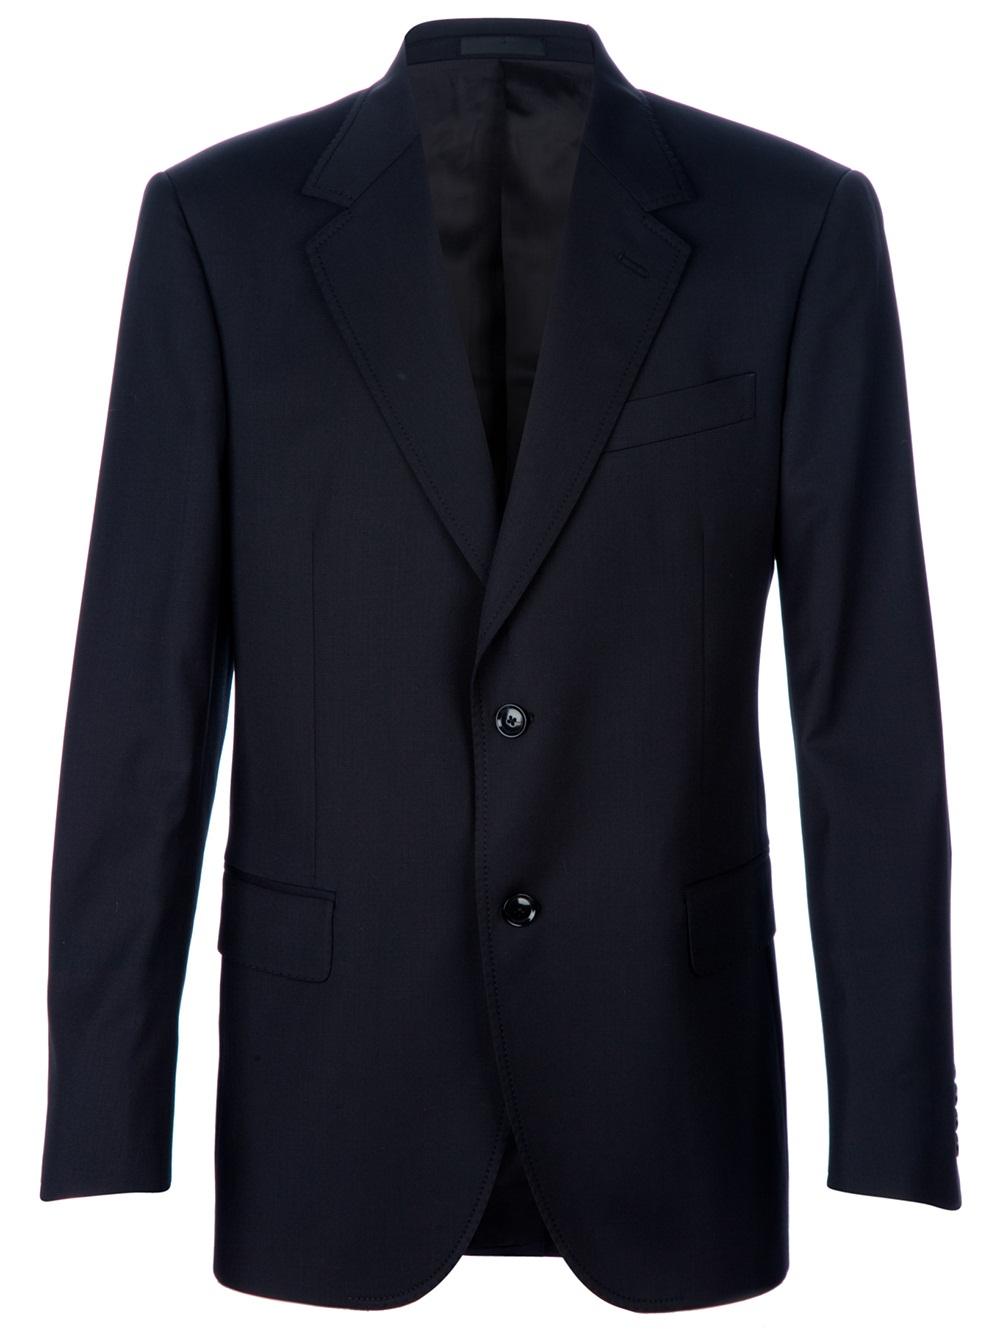 Lanvin Suit Jacket In Black For Men Lyst